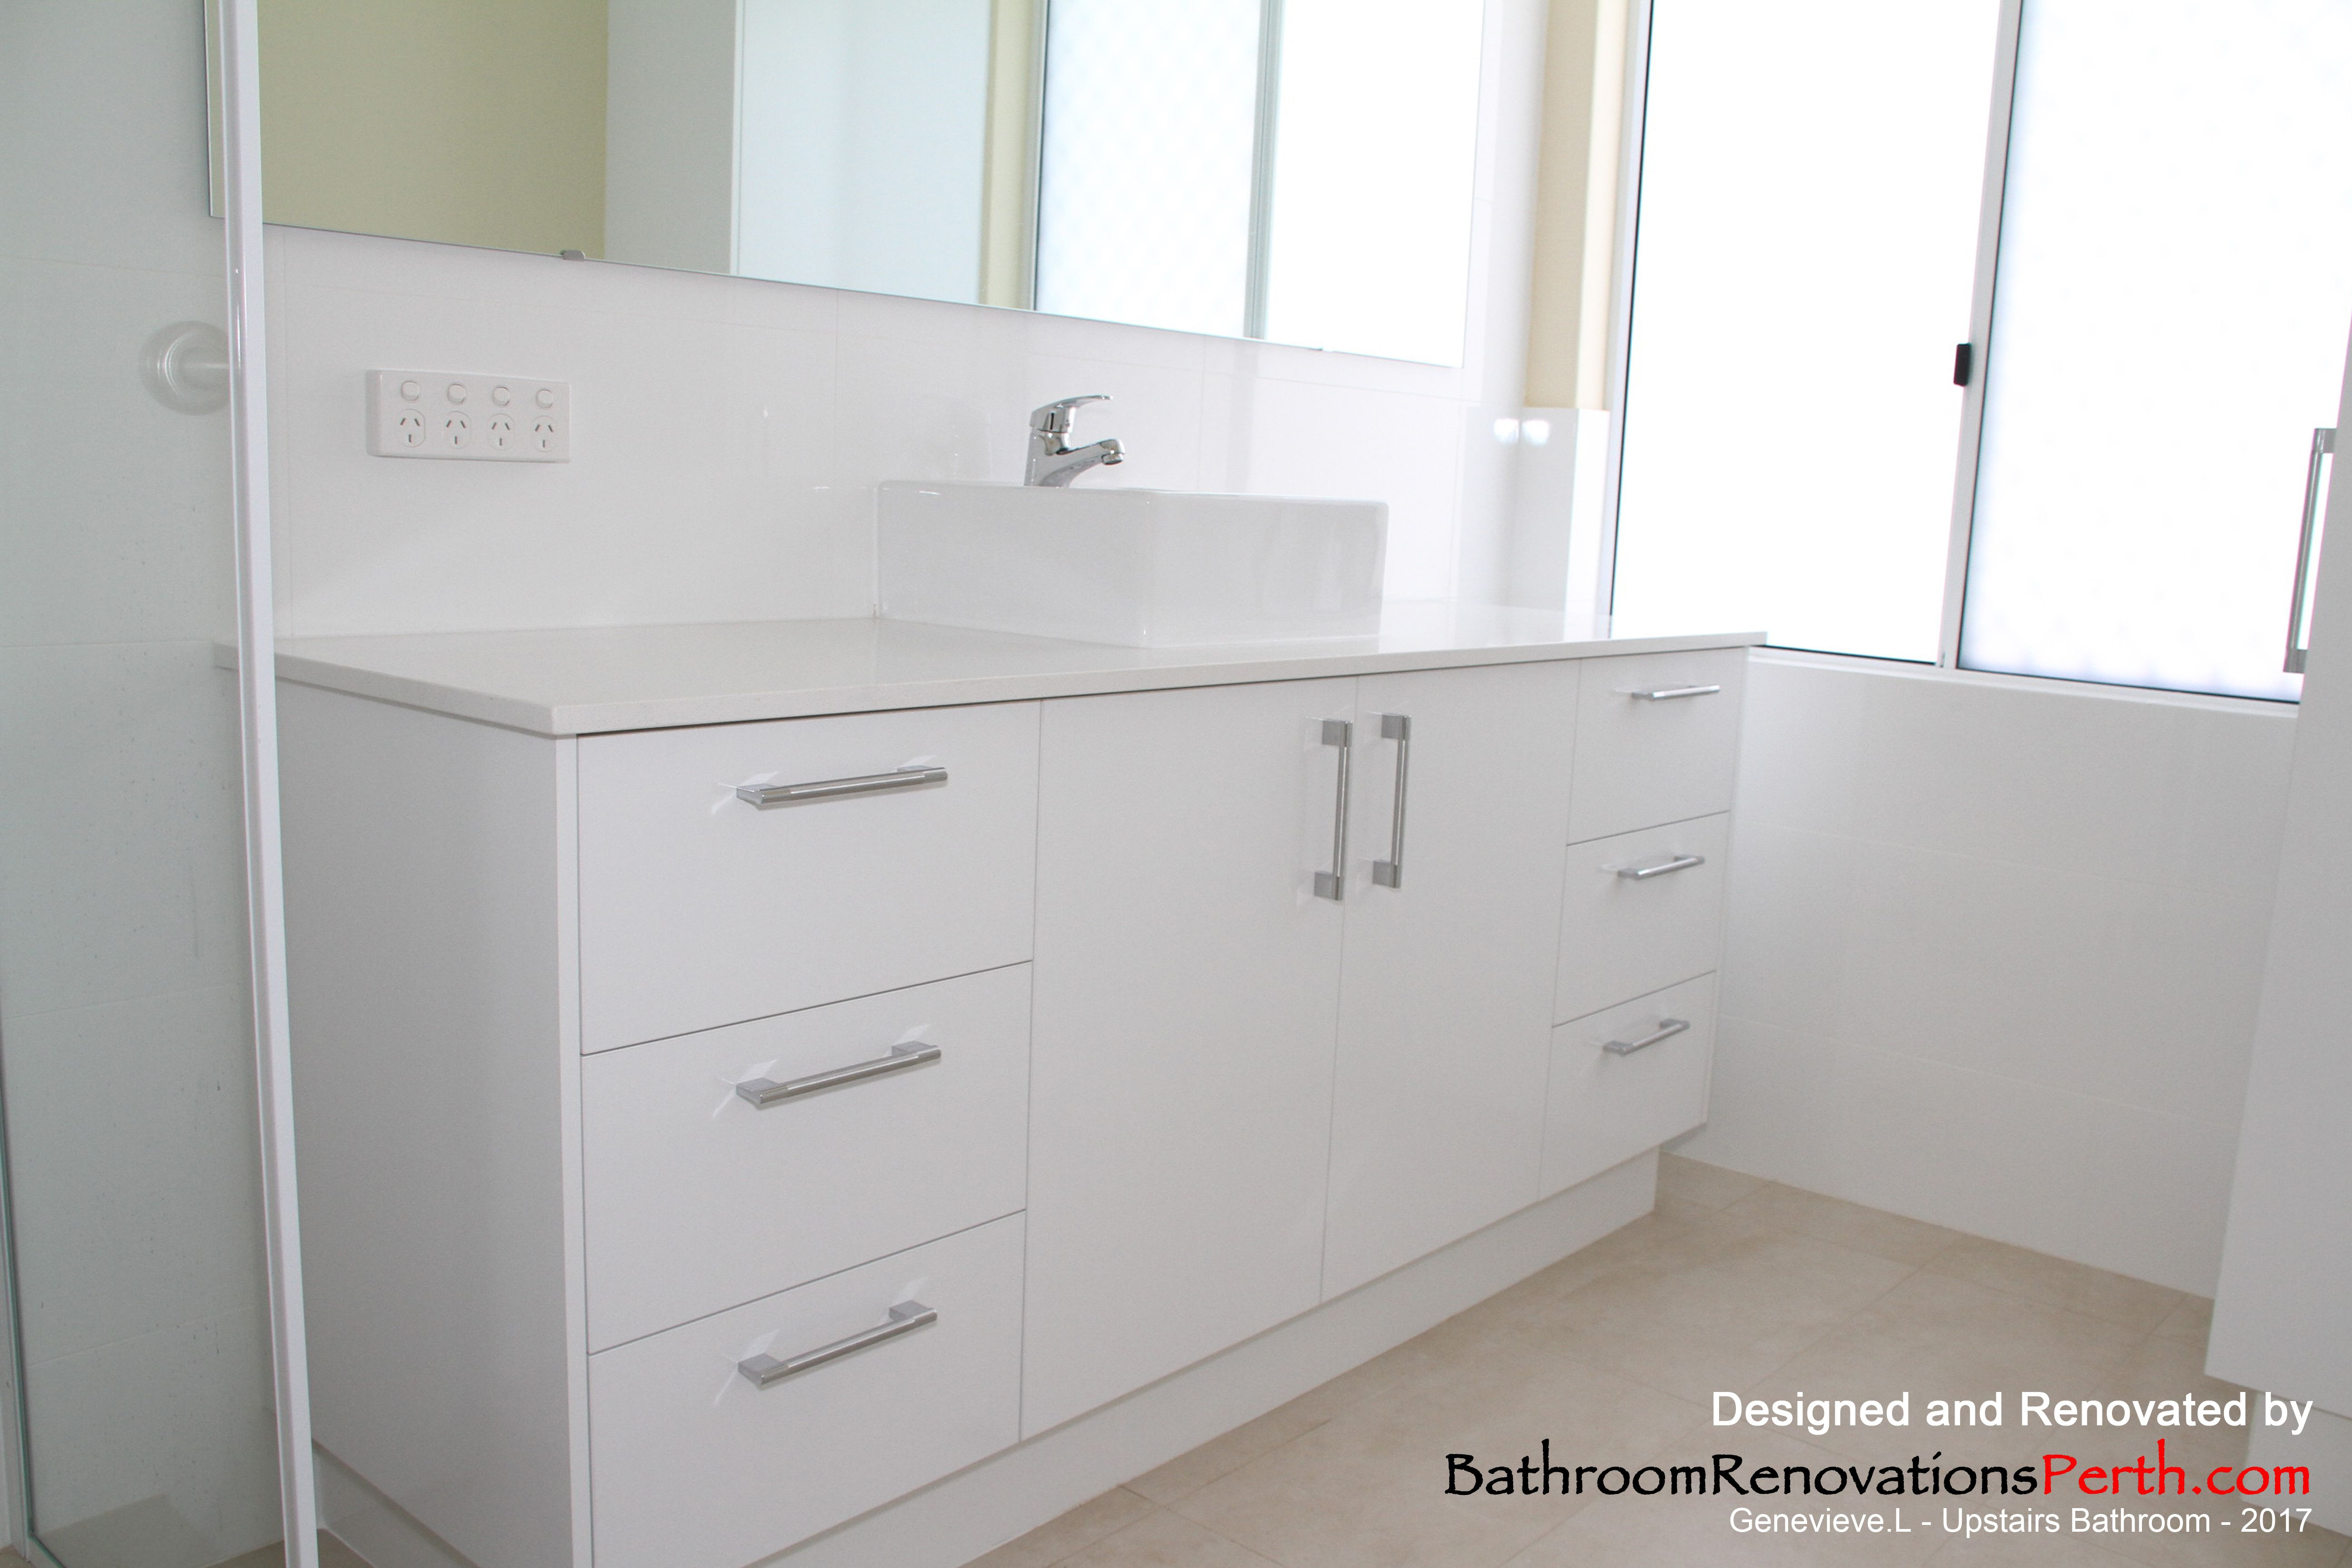 Upstairs bathroom designed & renovated by Bathroom Renovations Perth ...